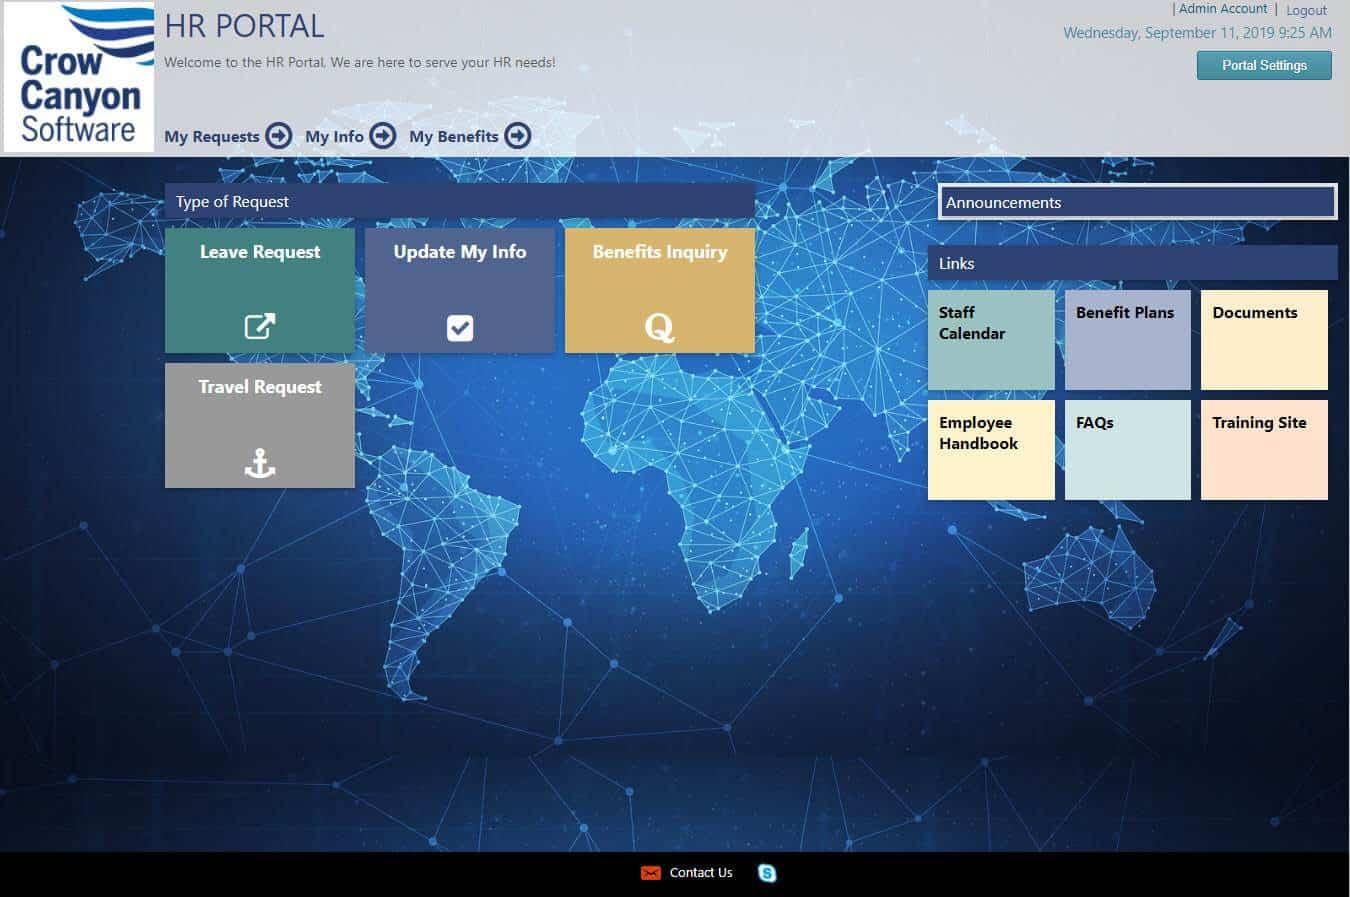 HR Portal Screen Shot